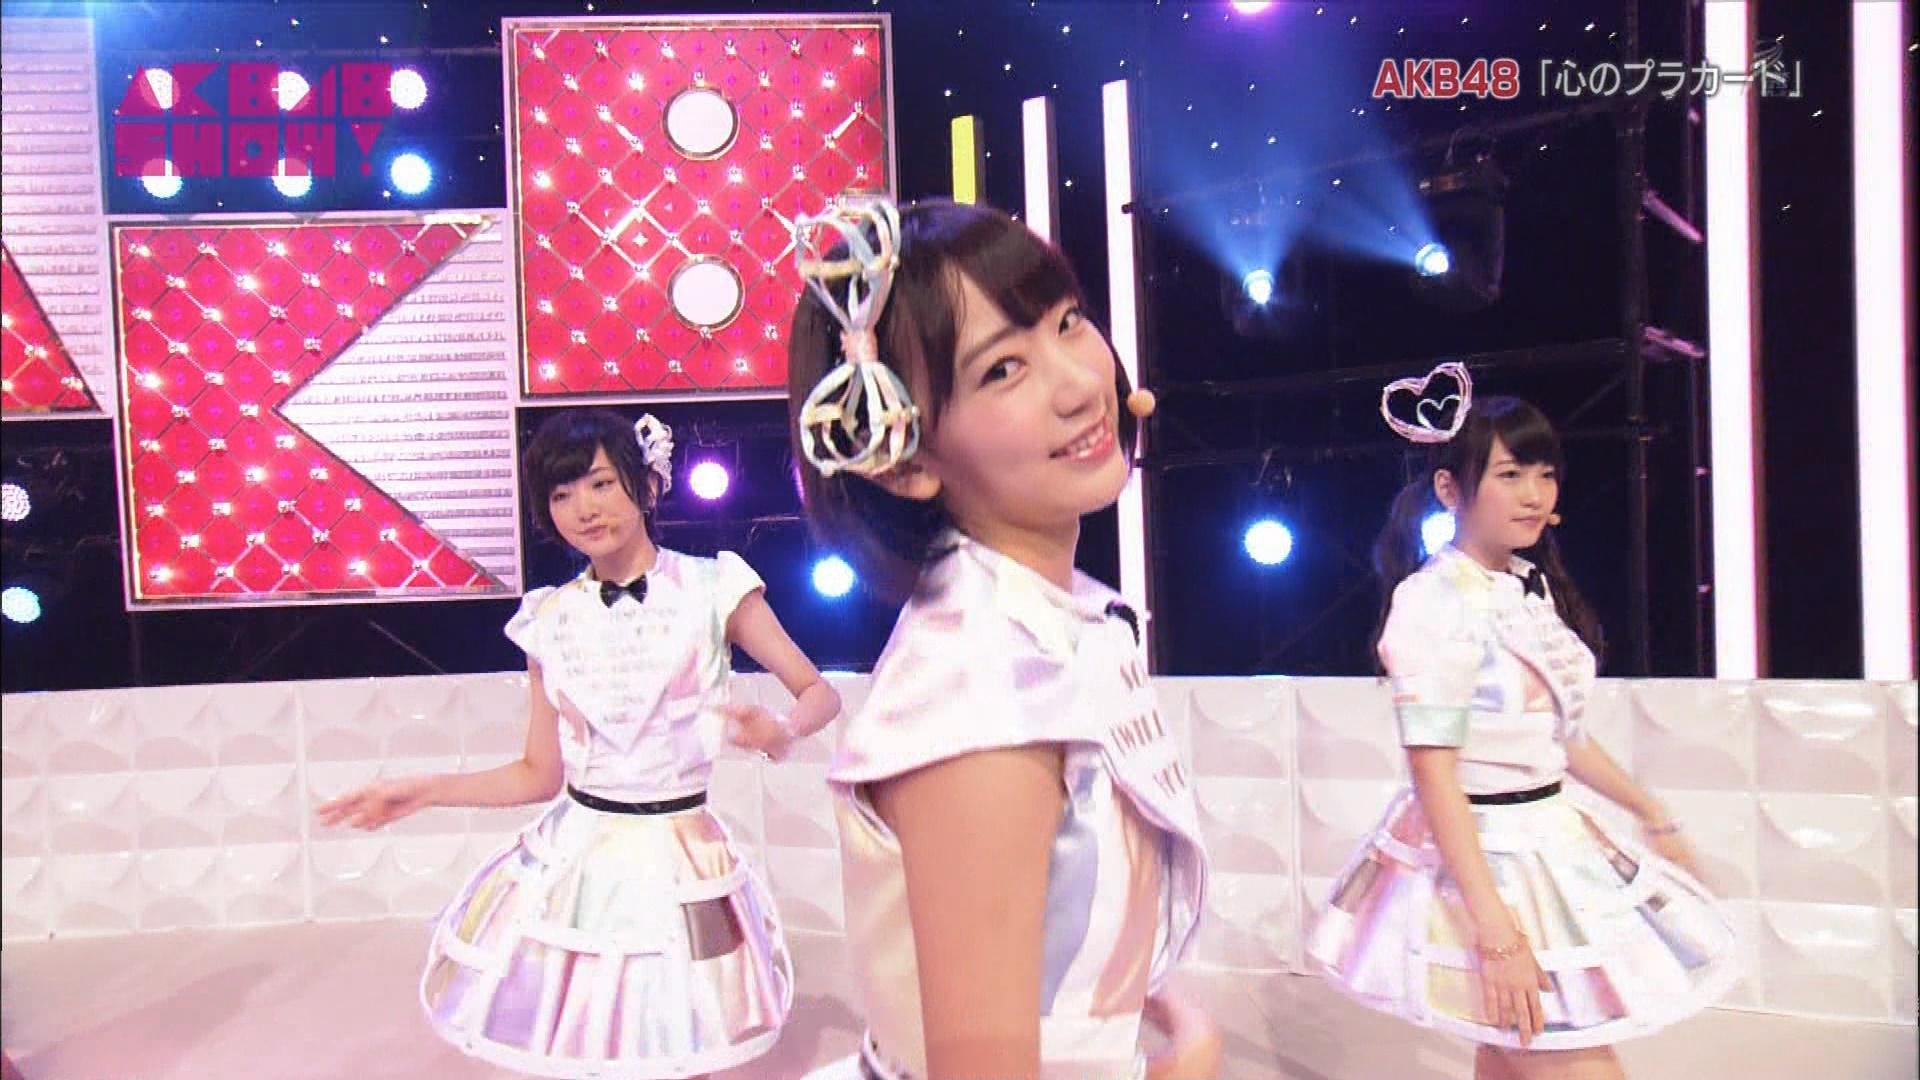 AKB48SHOW 心のプラカード 宮脇咲良 20140830 (17)